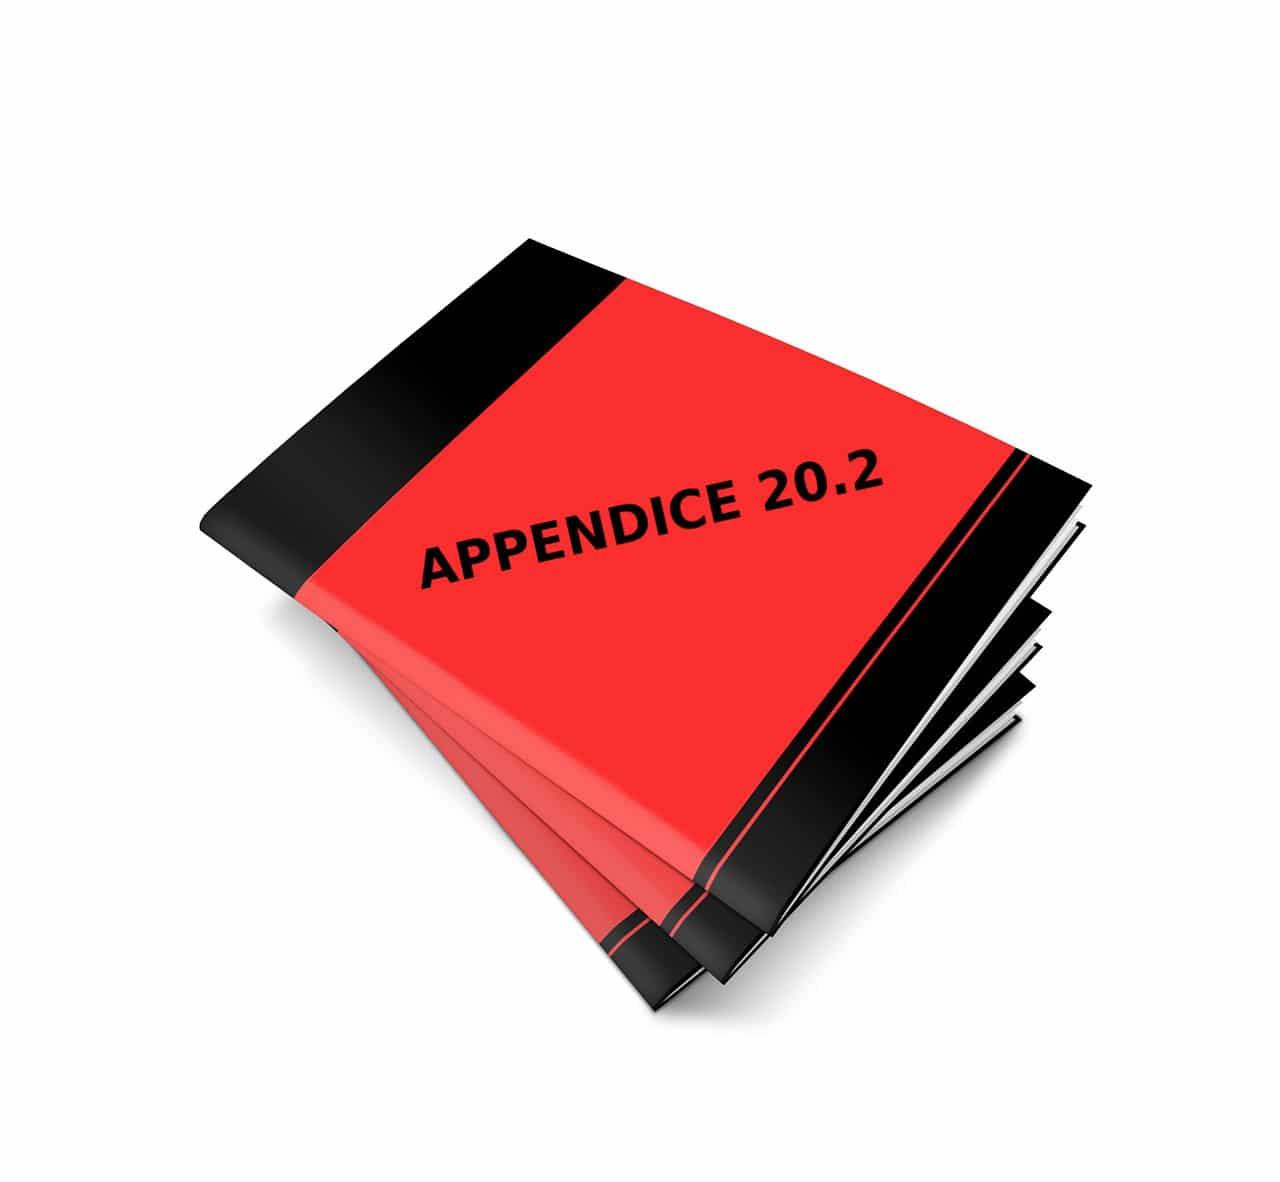 appendice SR 20.2